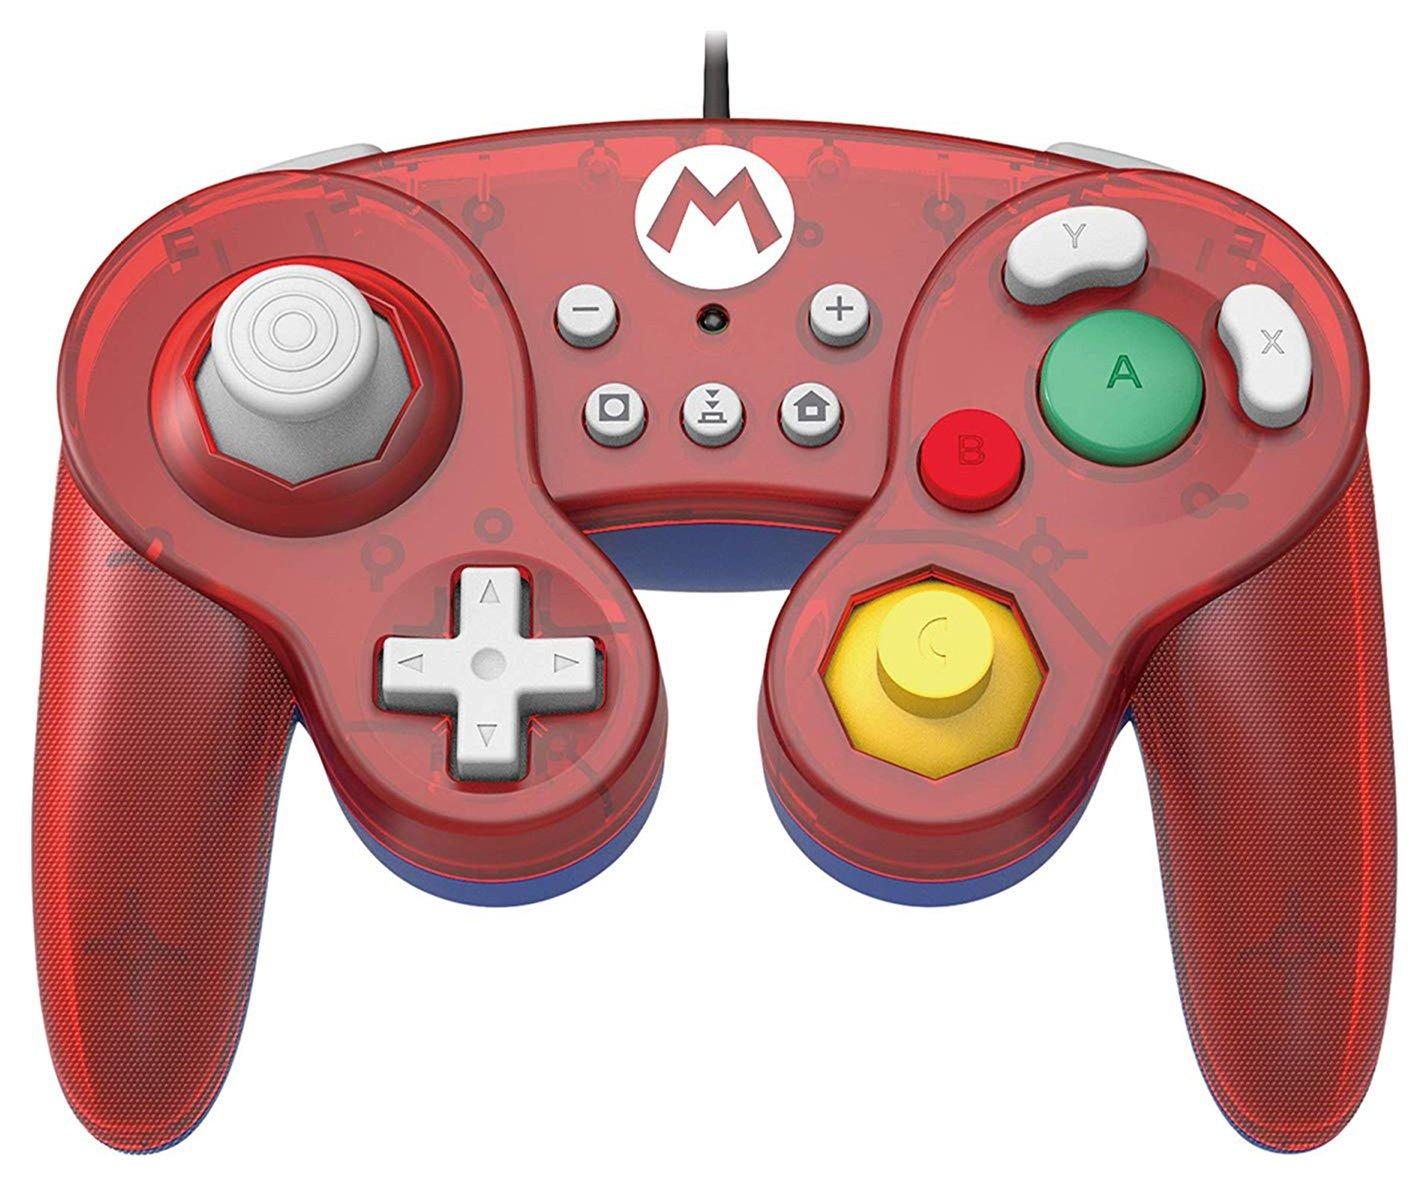 Super Smash Bros Nintendo Switch Gamepad Controller - Mario